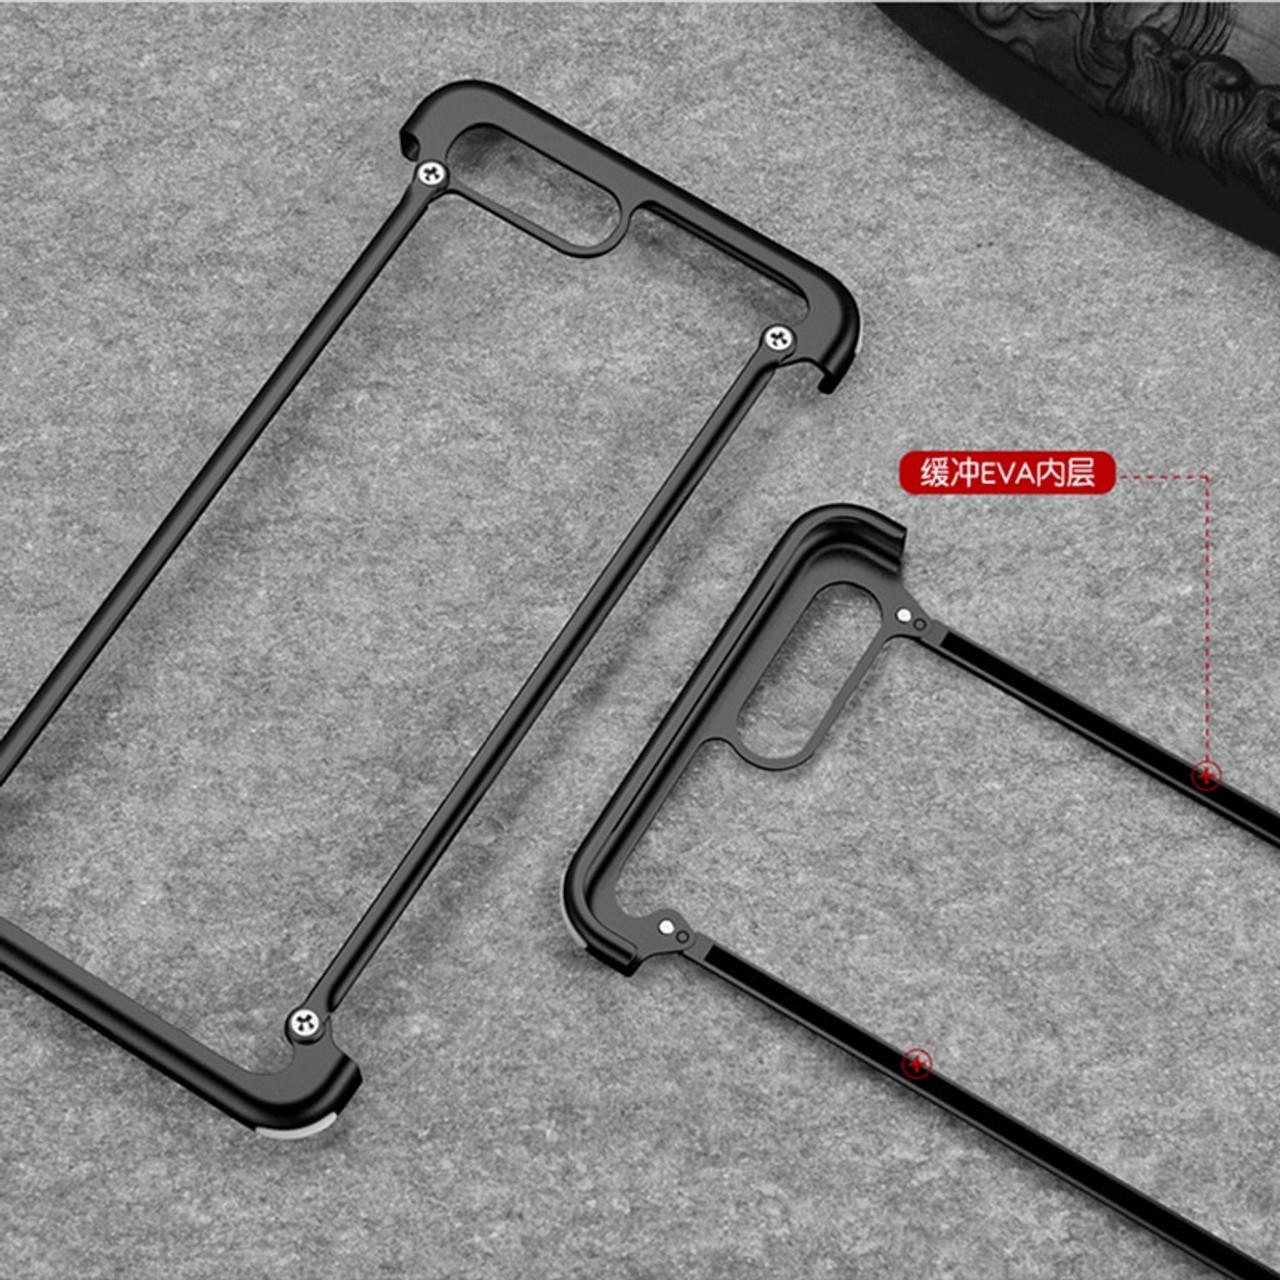 for Nubia Z17 case Aluminum metal bumper case for ZTE nubia Z17 lite cases